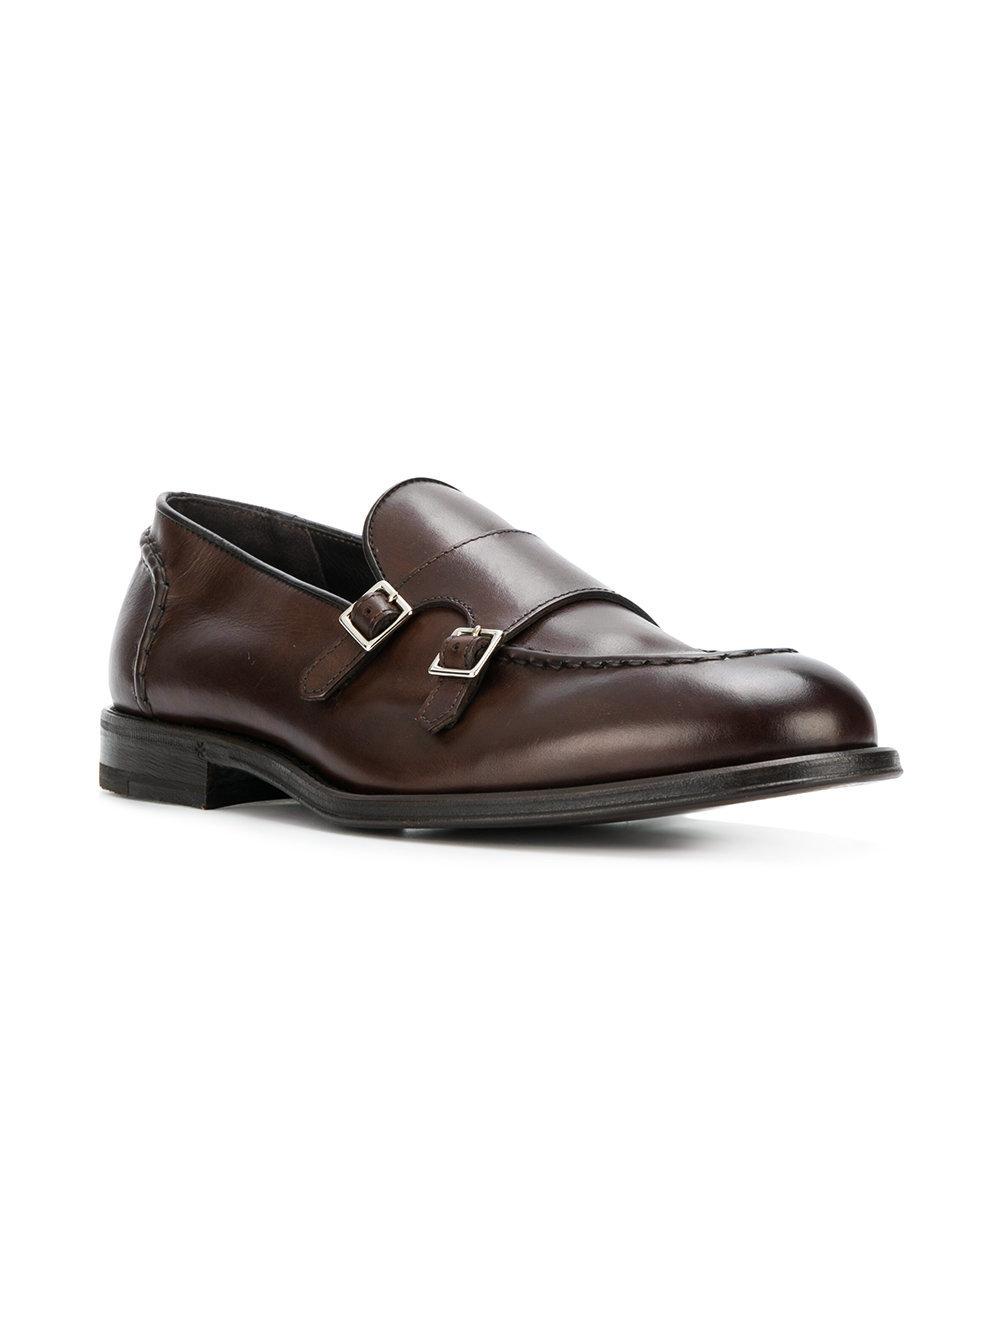 Henderson Baracco Slip On D Loafers